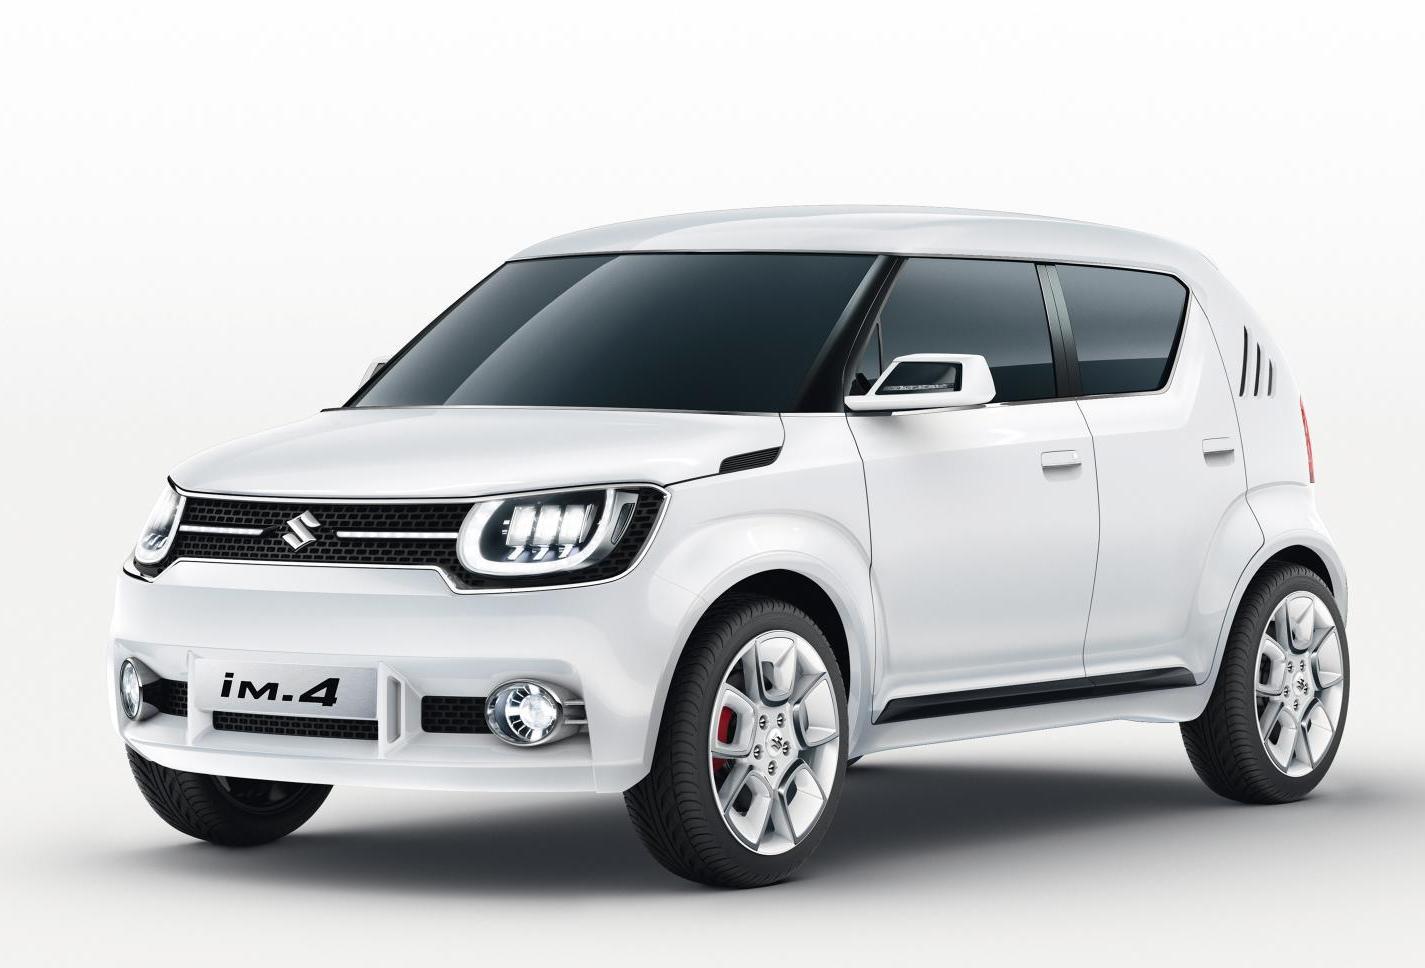 New Suzuki Im 4 Maruti Yba 4x4 Mini Suv Concept Revealed